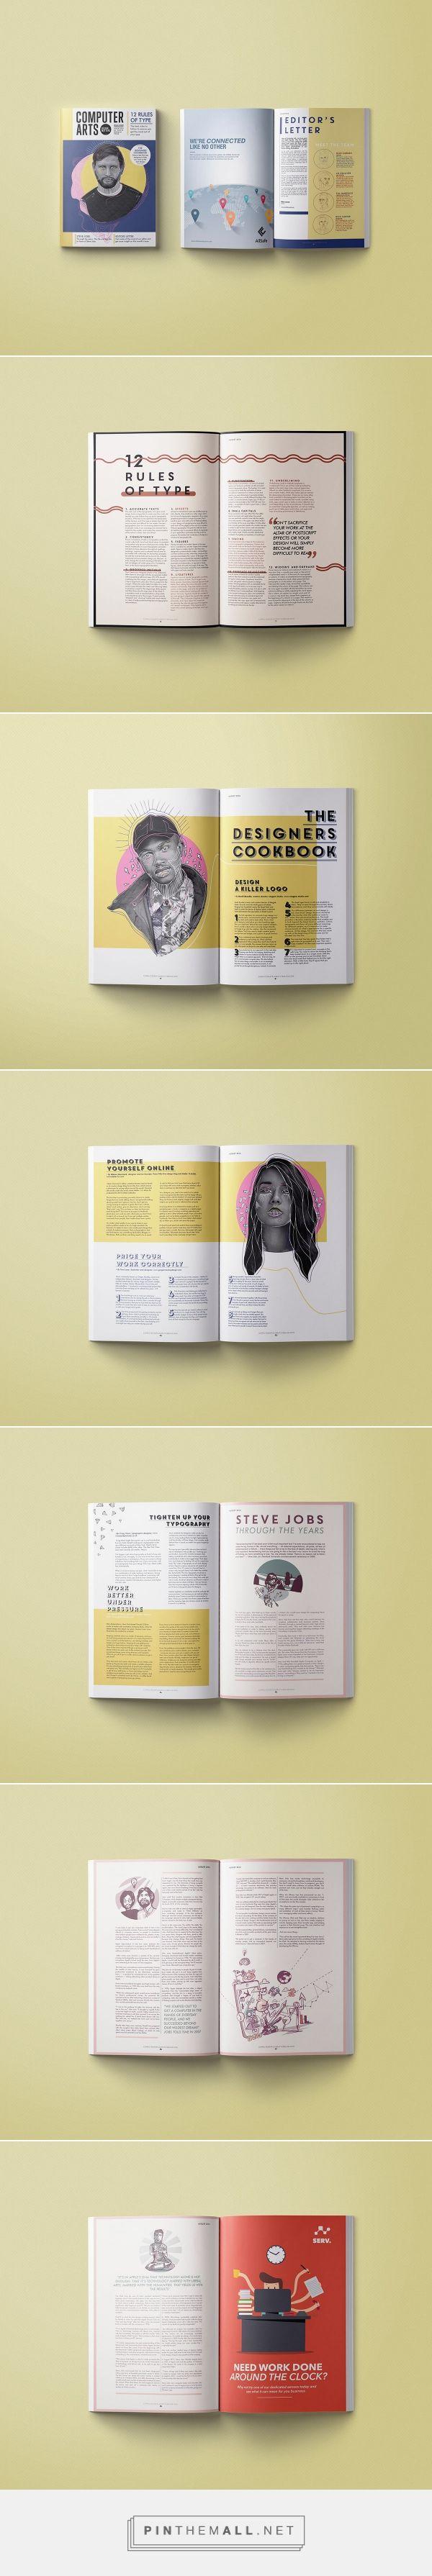 Computer Arts Magazine layout design by Jolanda van Rooyen